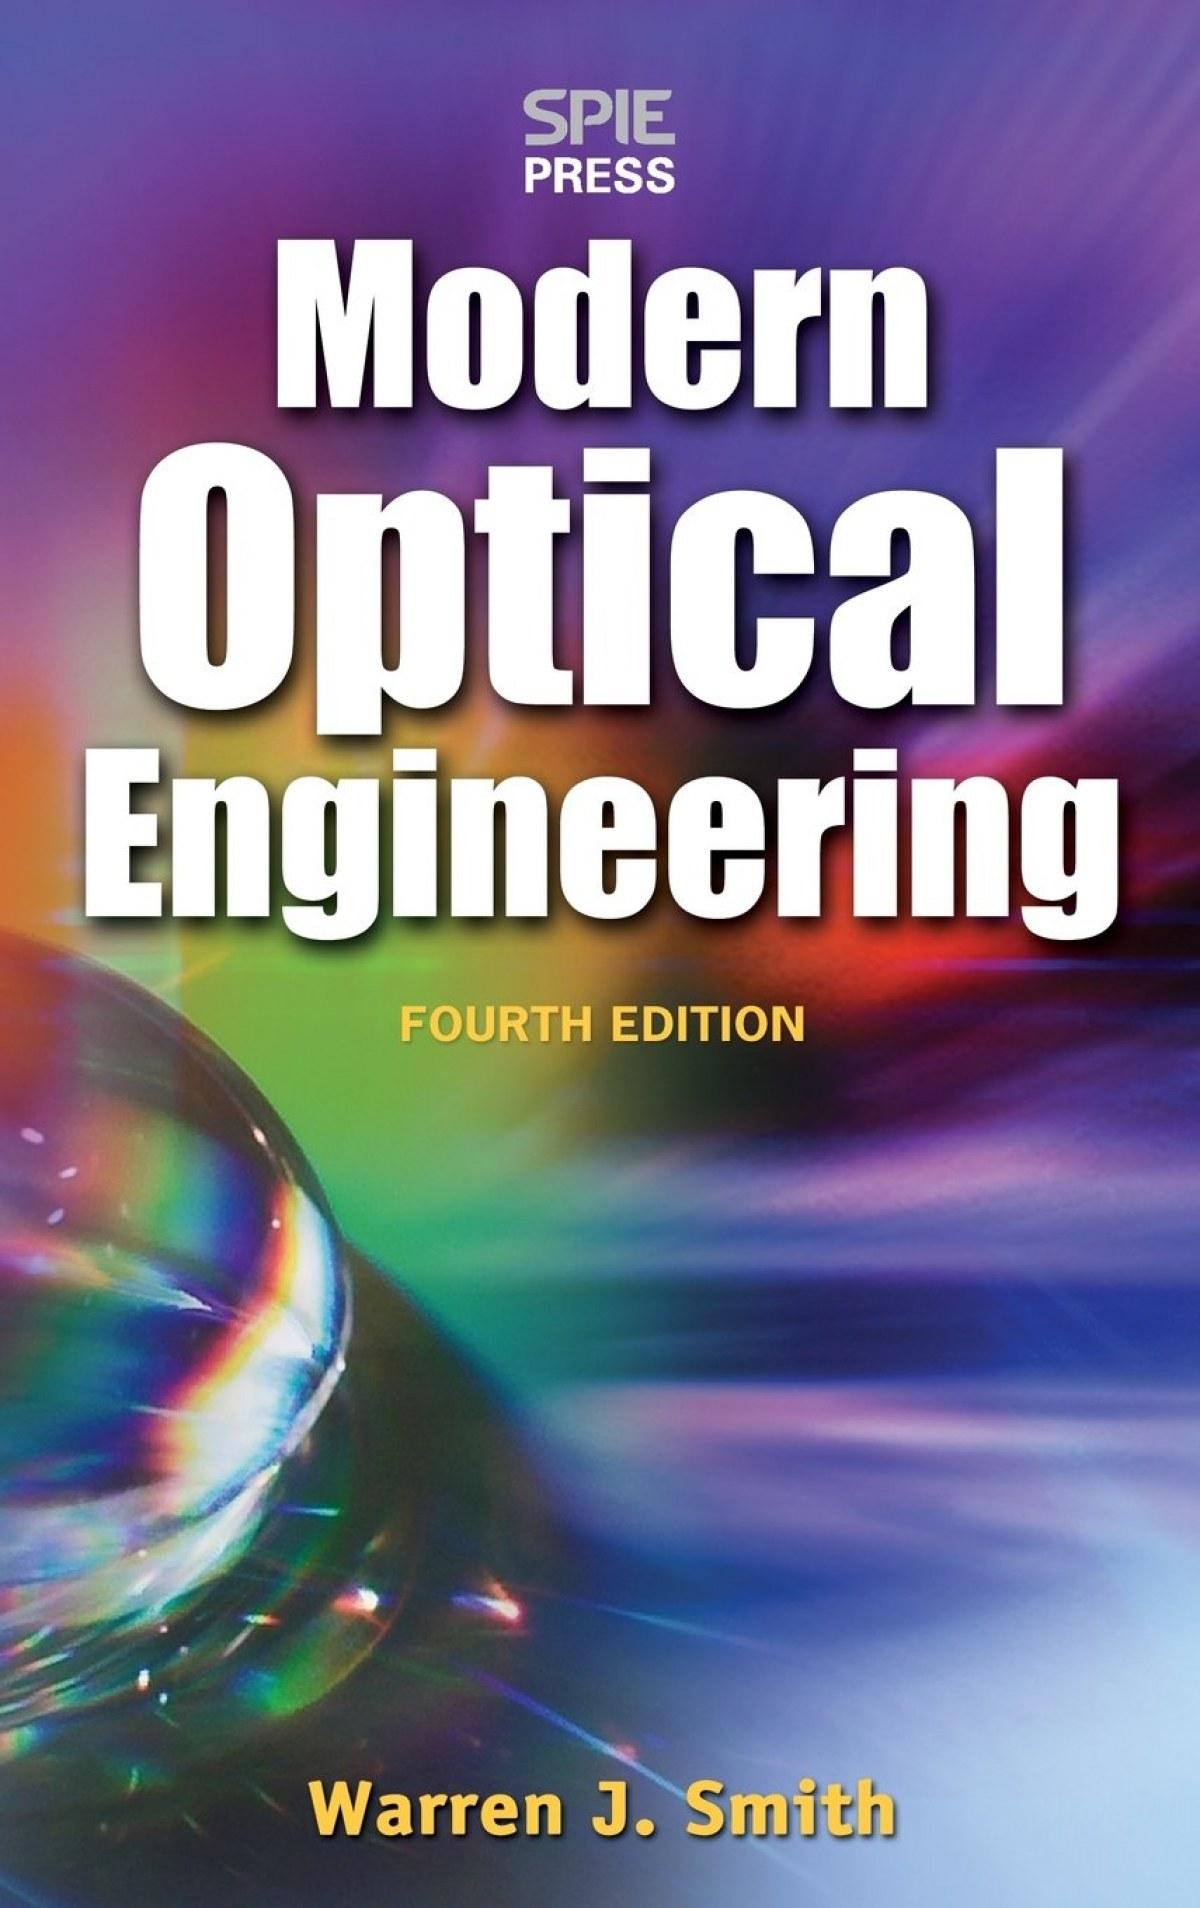 MODERN OPTICAL ENGINEERING, 4/ED